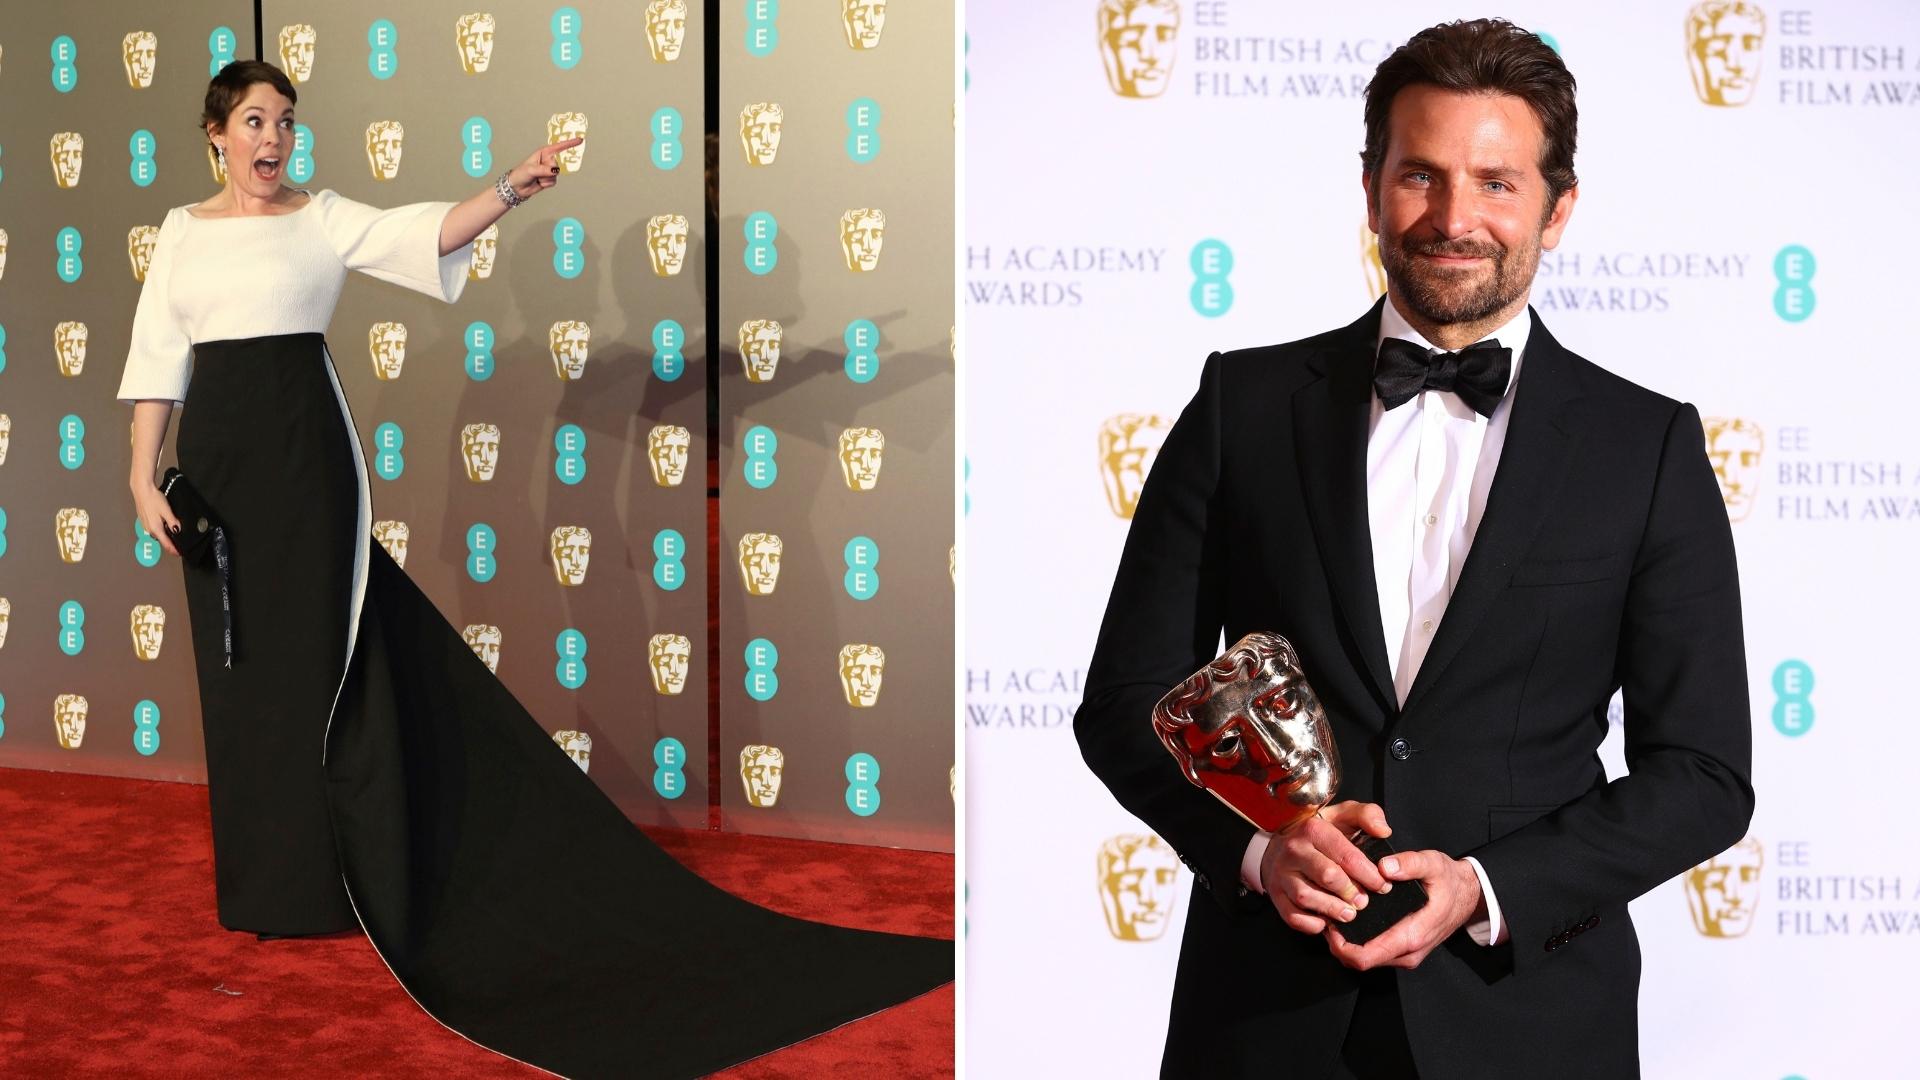 Bafta Winners 2019: Who Won What At 2019 BAFTA Film Awards